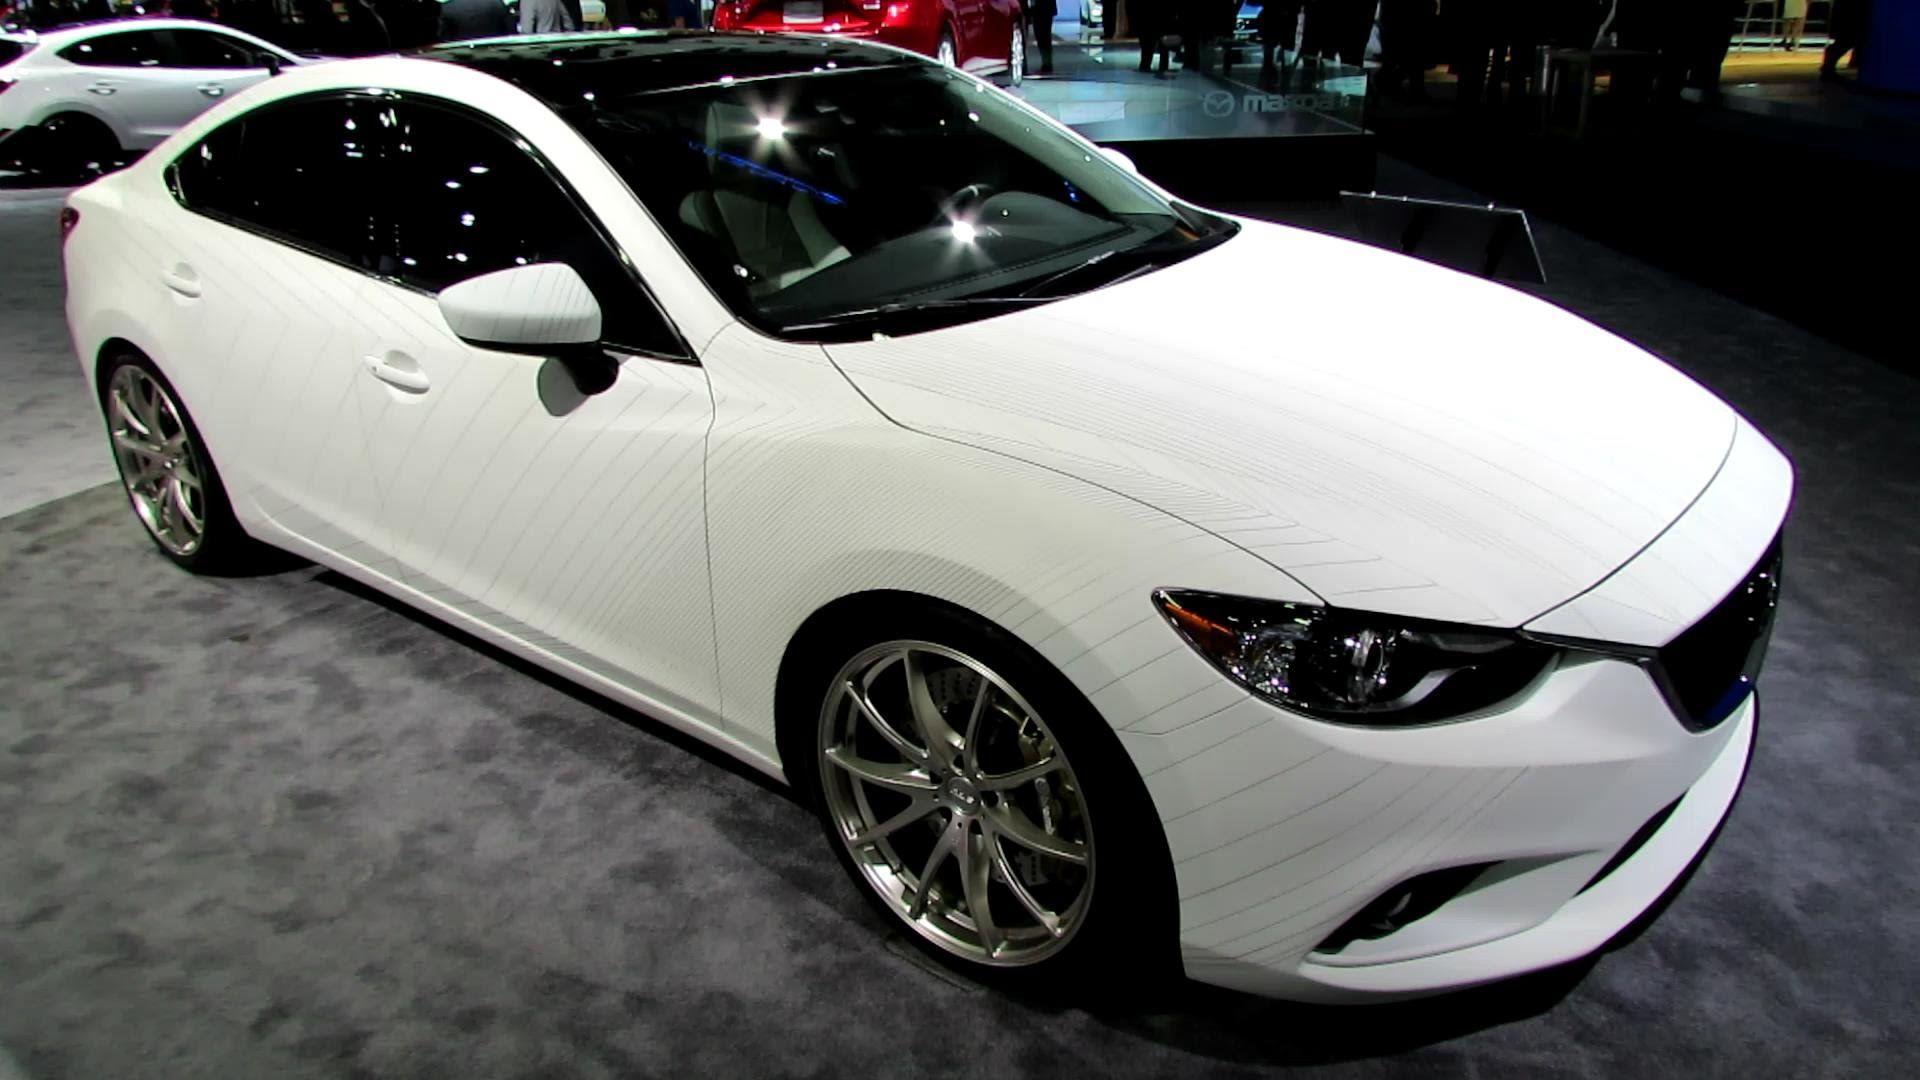 Mazda 6 2015 Interior. 2015 Mazda 6 ClubSport Concept   Exterior And  Interior Walkaround   2014 Detroit Auto Show